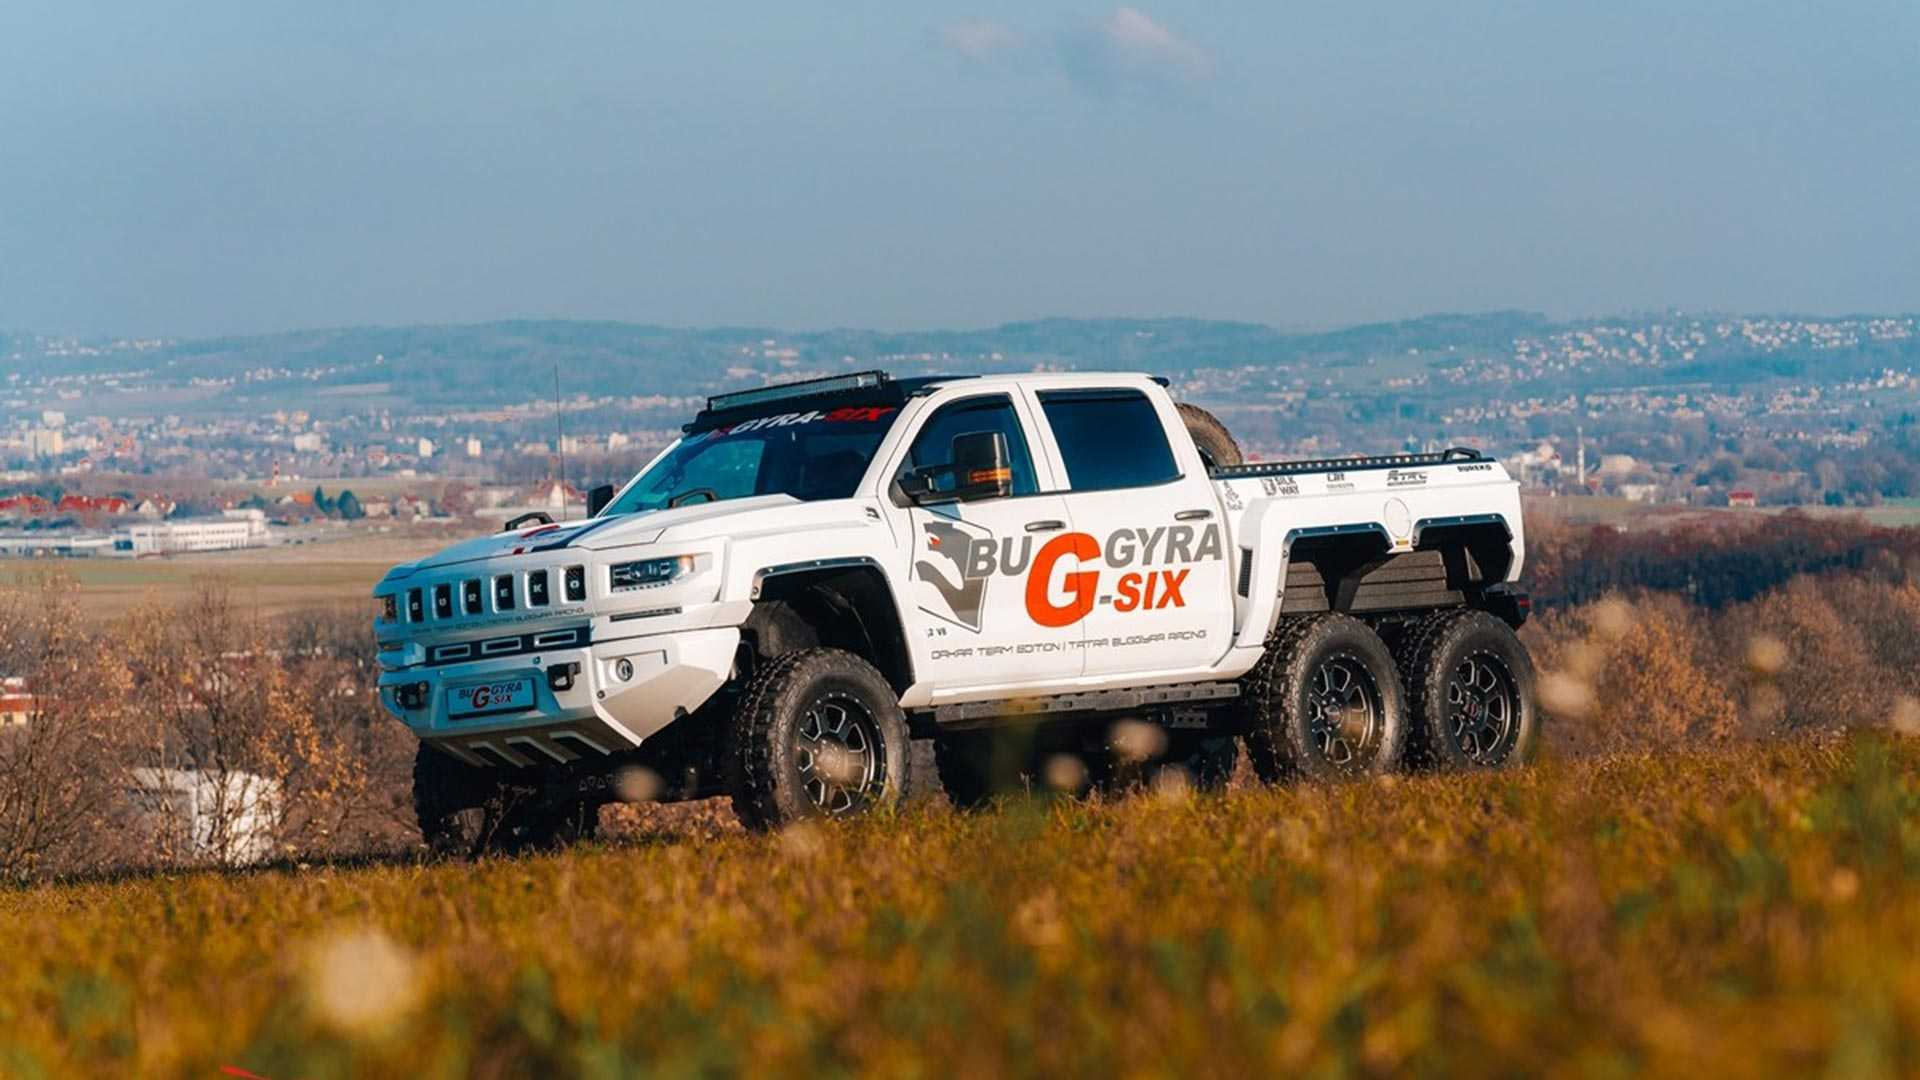 Чехи превратили Chevrolet Silverado в трехосного монстра 1